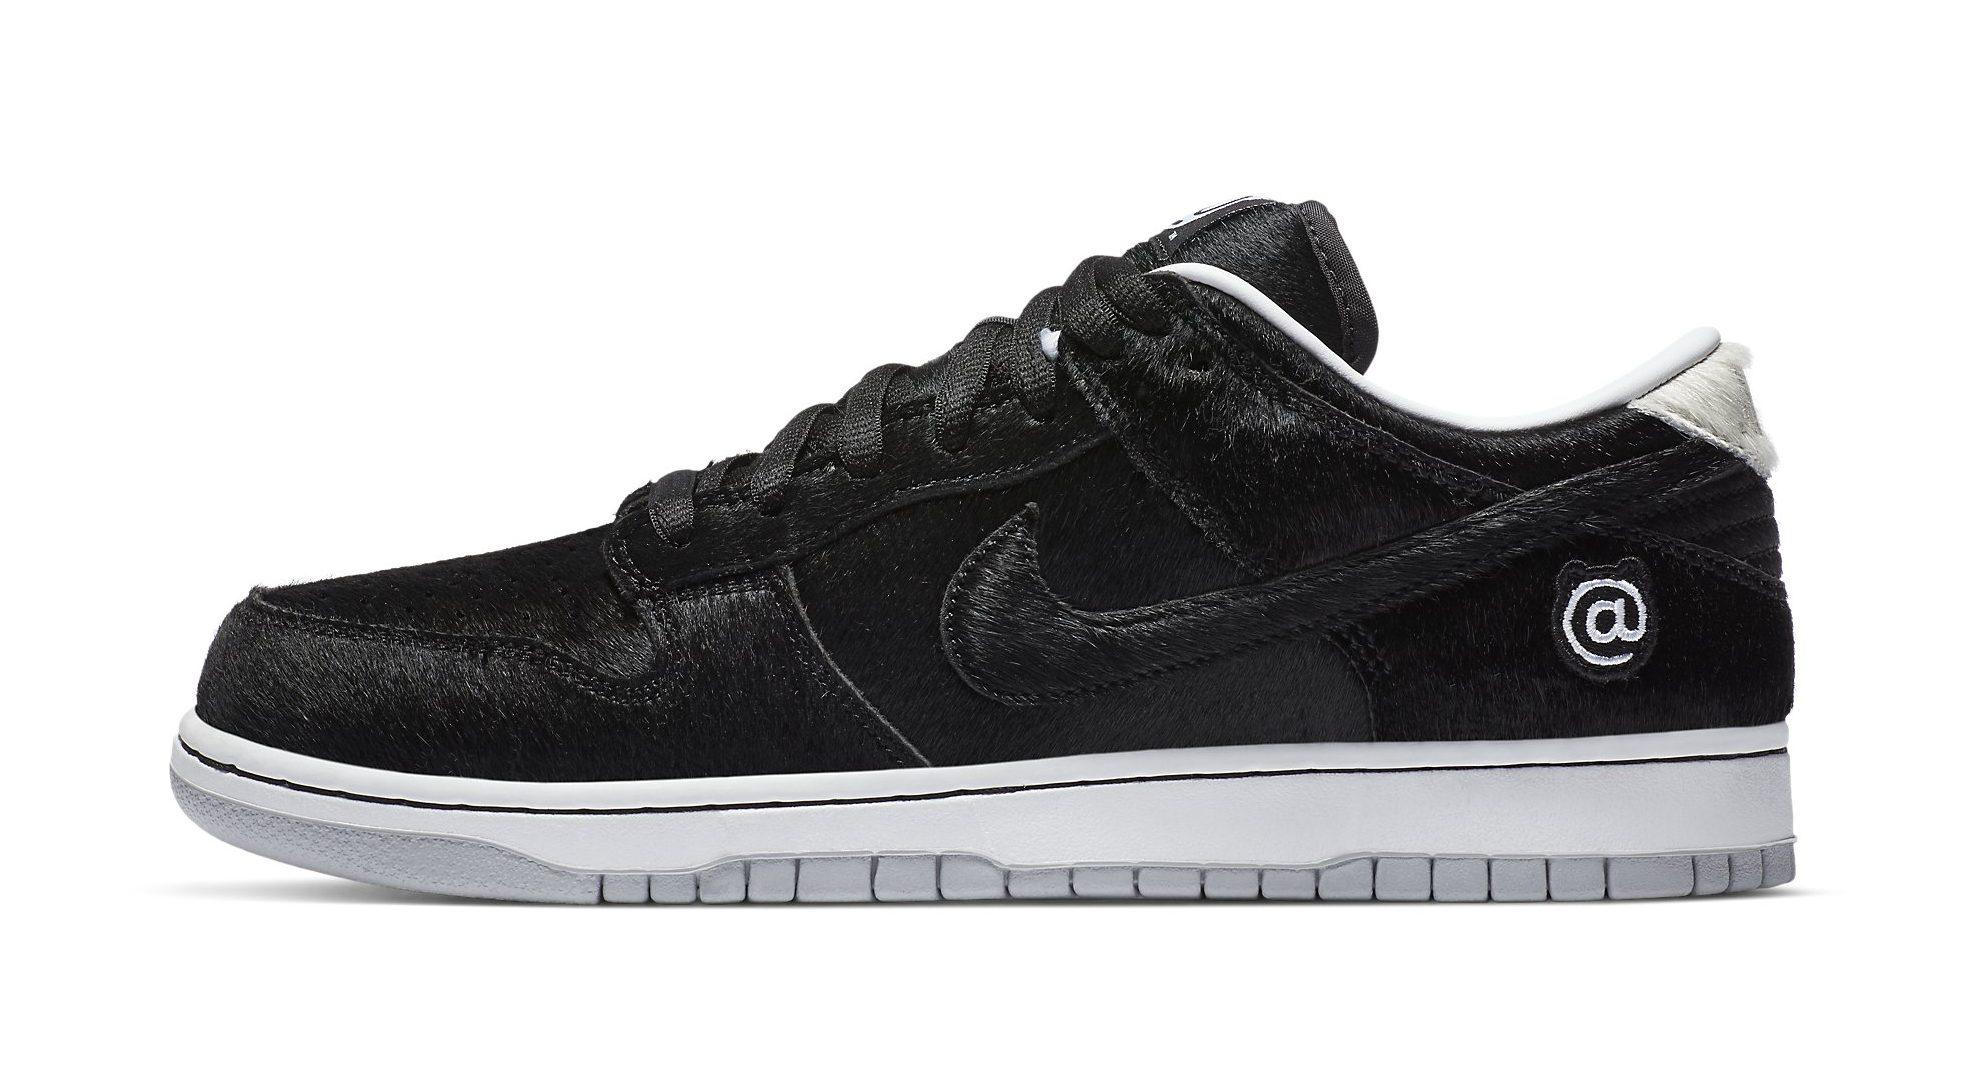 Nike x Medicom 'Bearbrick' Release Info